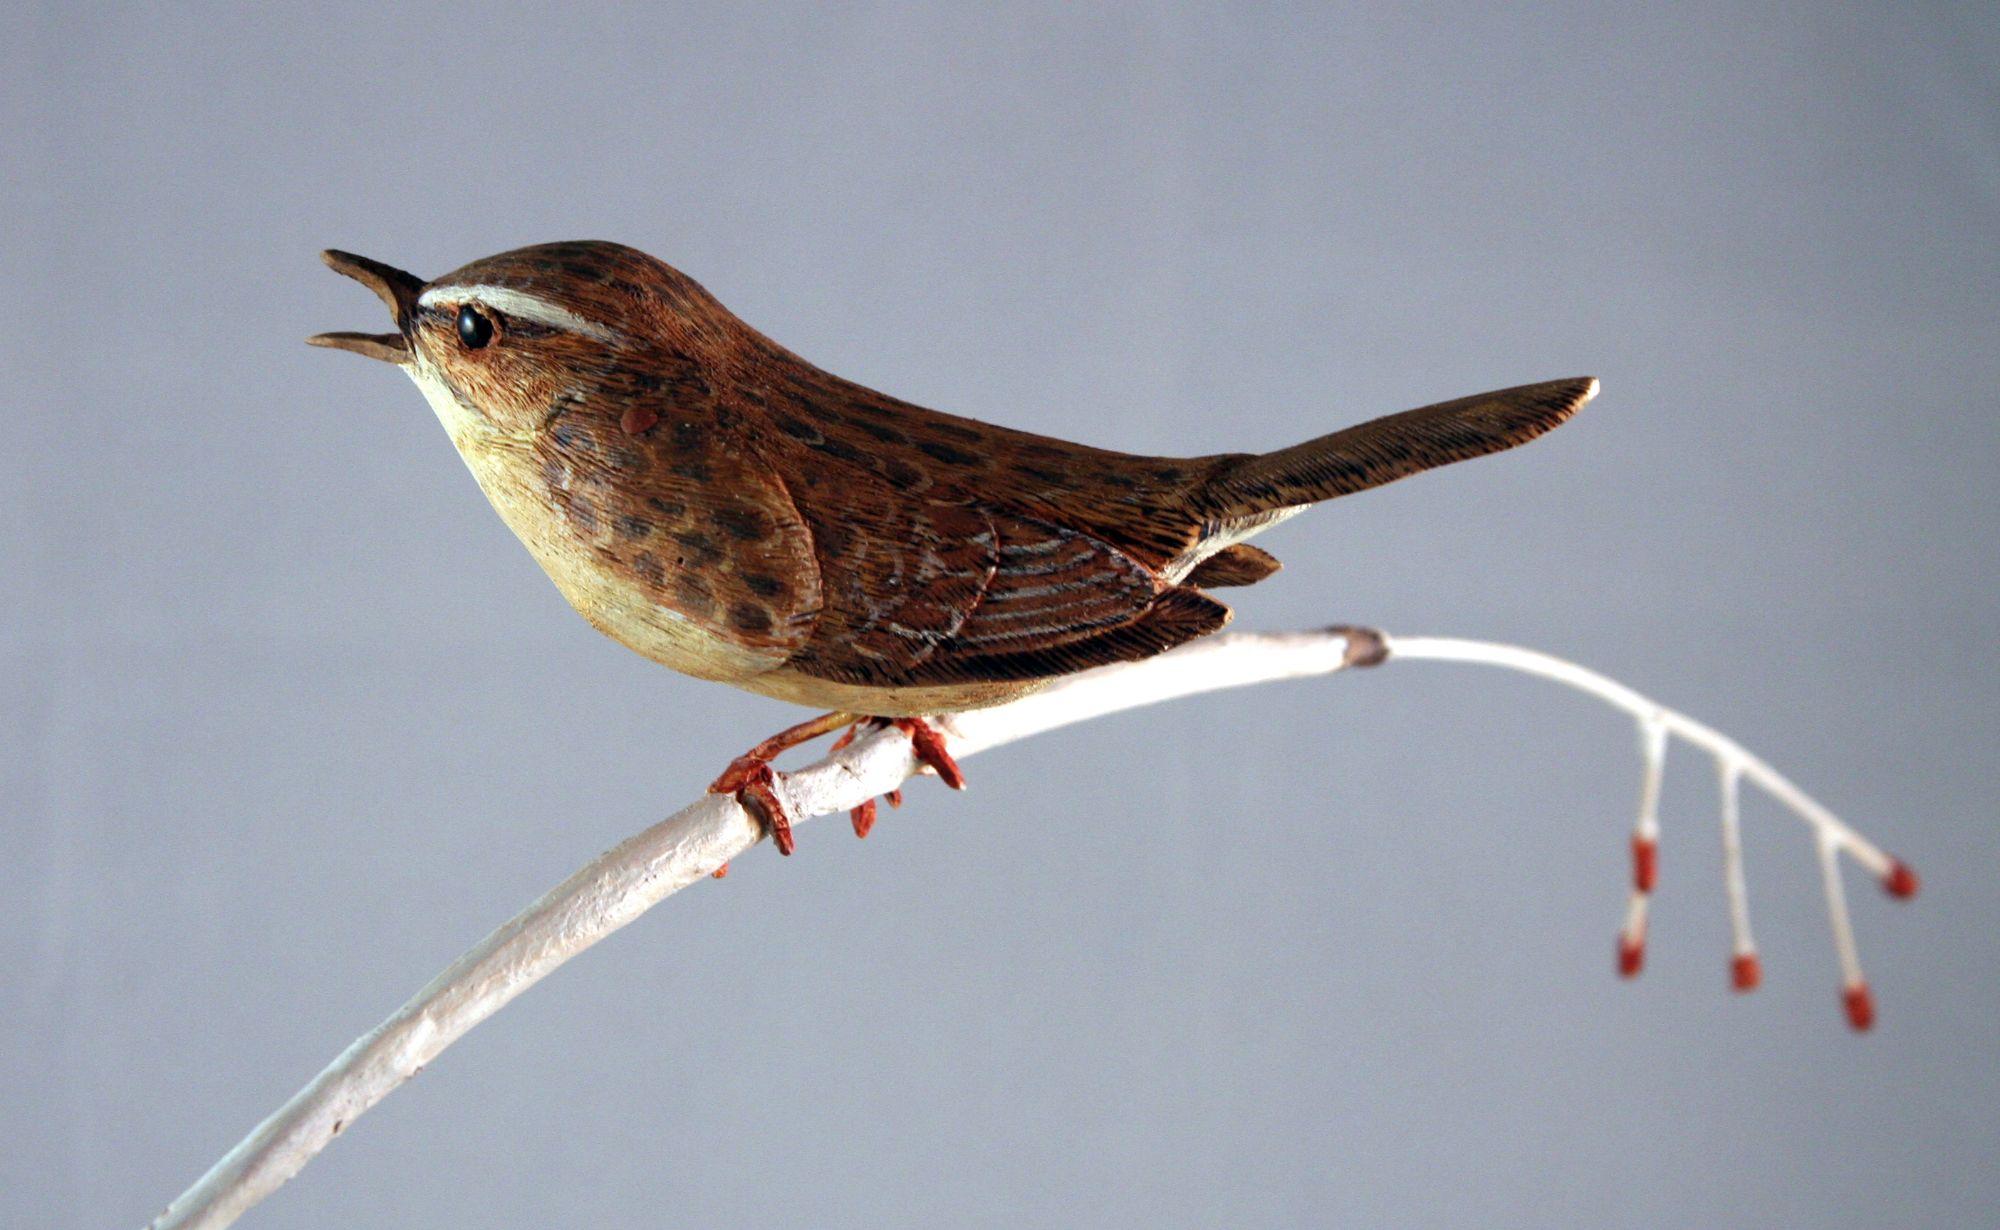 Sedgewarbler